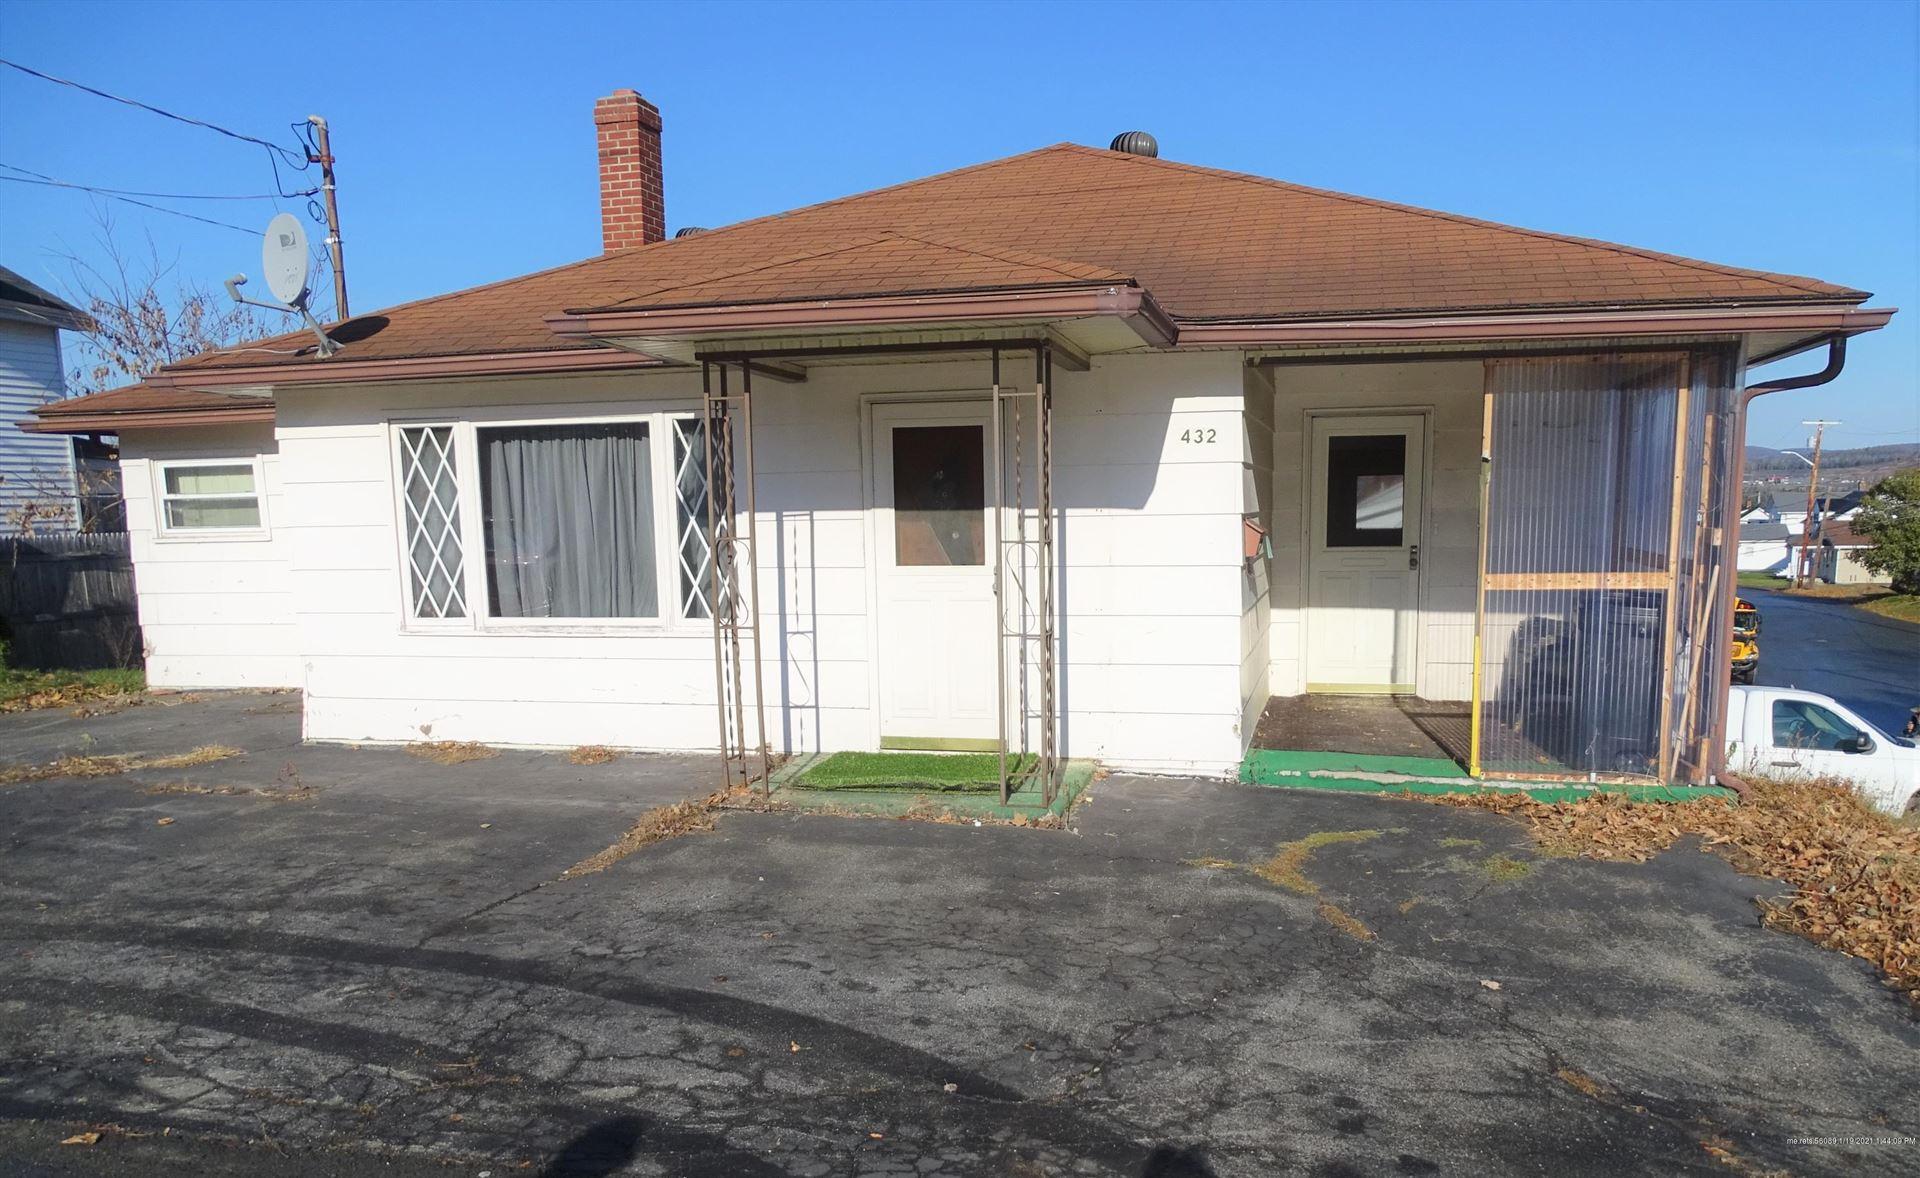 Photo of 432 St Thomas Street, Madawaska, ME 04756 (MLS # 1480061)